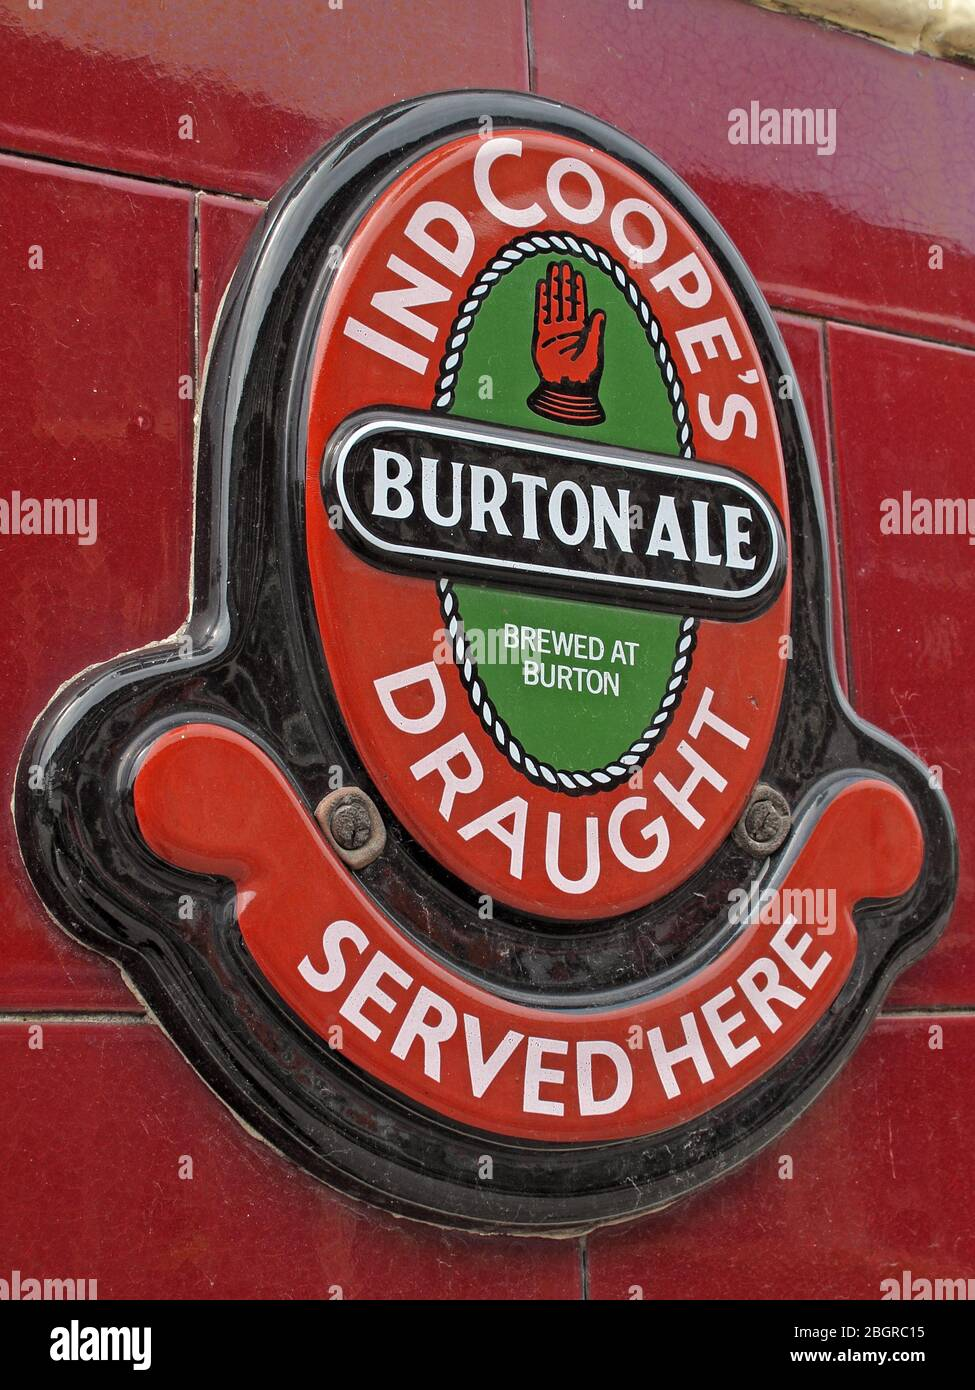 @hotpixuk,Hotpixuk,GoTonySmith,Historic tiled sign,Burton Ale,brewer,brewers,ale,bar,pub,bitter,traditional,English,bitter beer,pub sign,England,UK,red,green